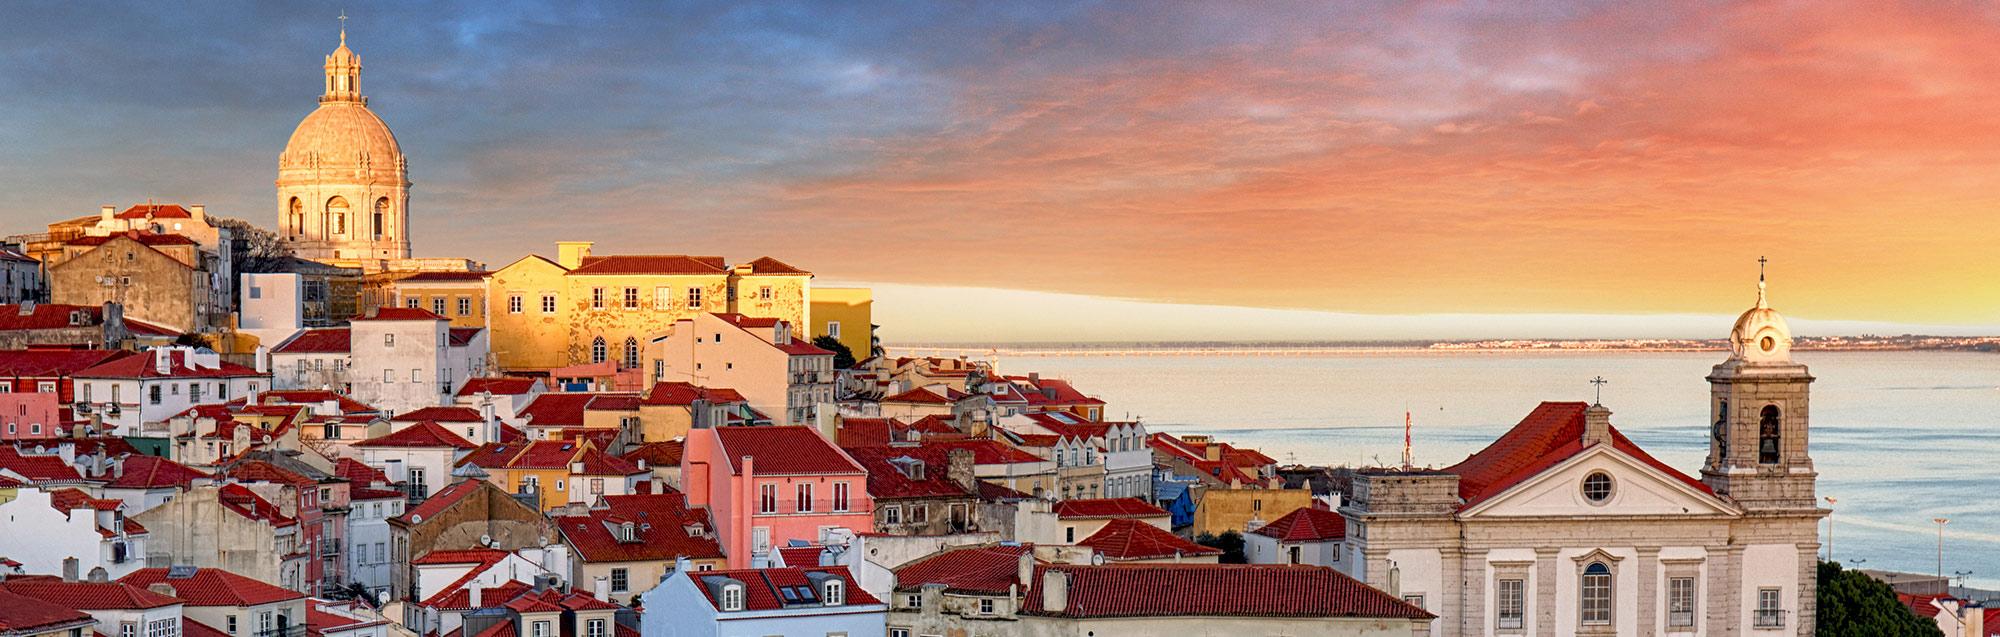 Sprachreise Lissabon